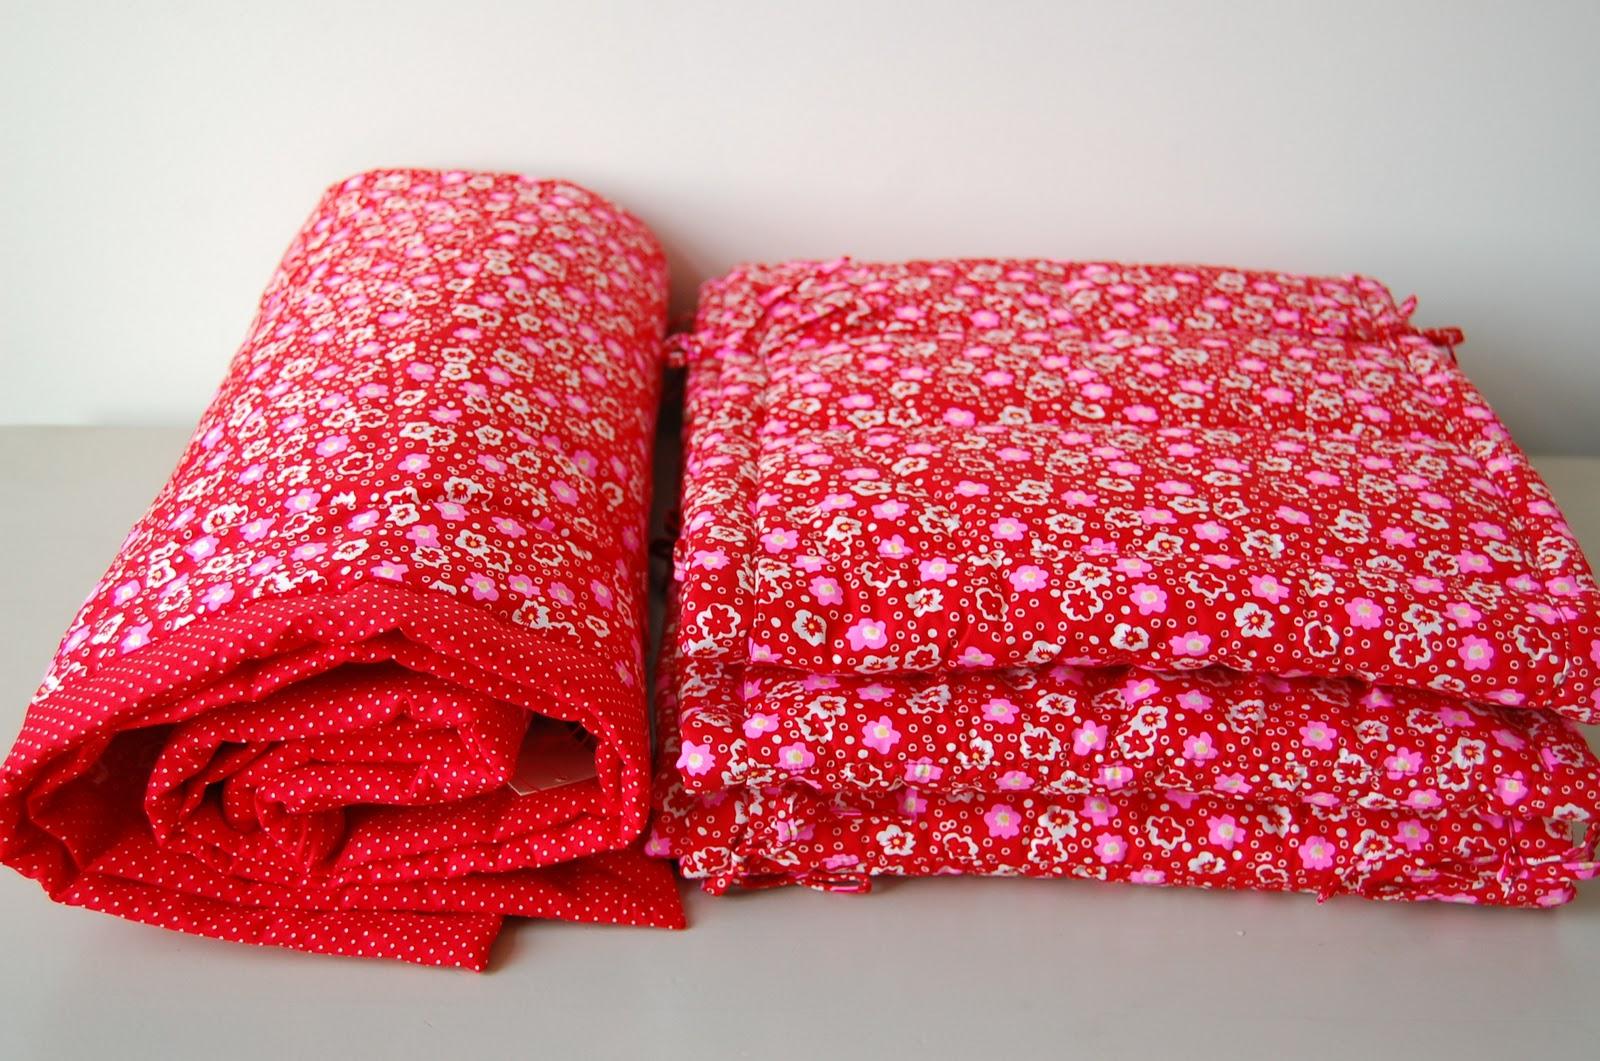 rose avril petit pan pour les petits. Black Bedroom Furniture Sets. Home Design Ideas